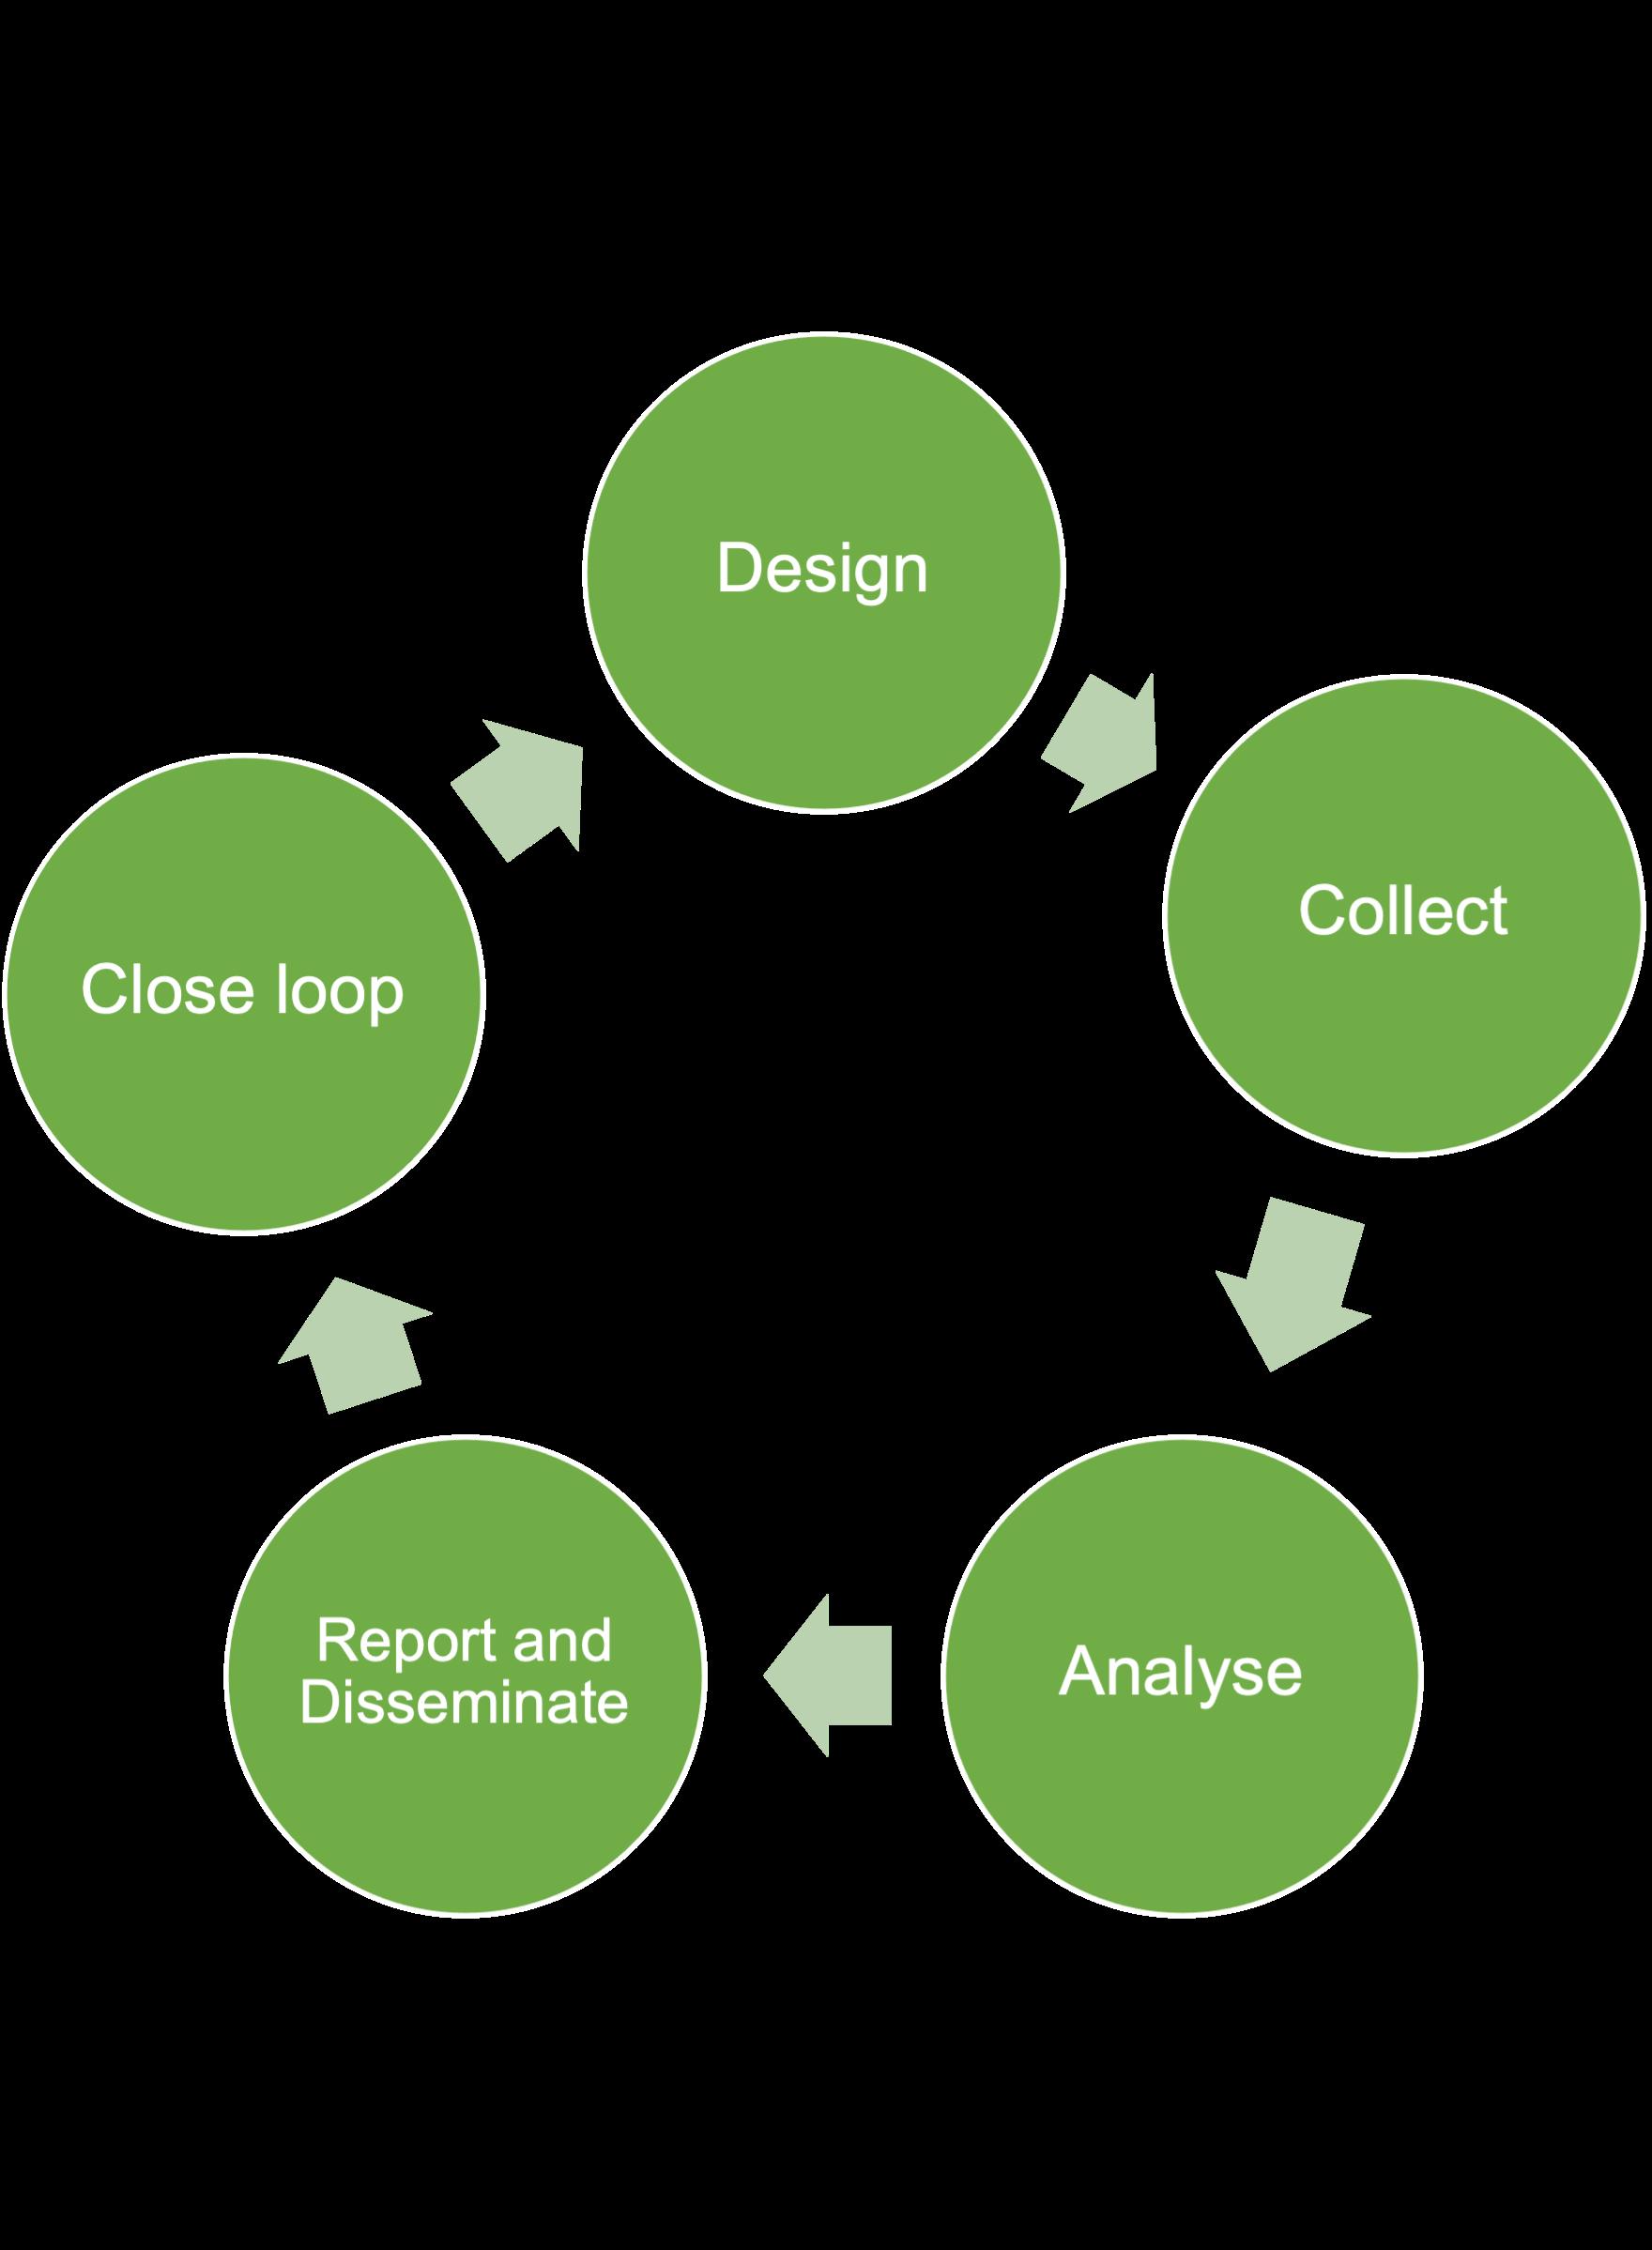 Circle diagram with Design, Collect, Analyse, Report & Disseminate, Close Loop.